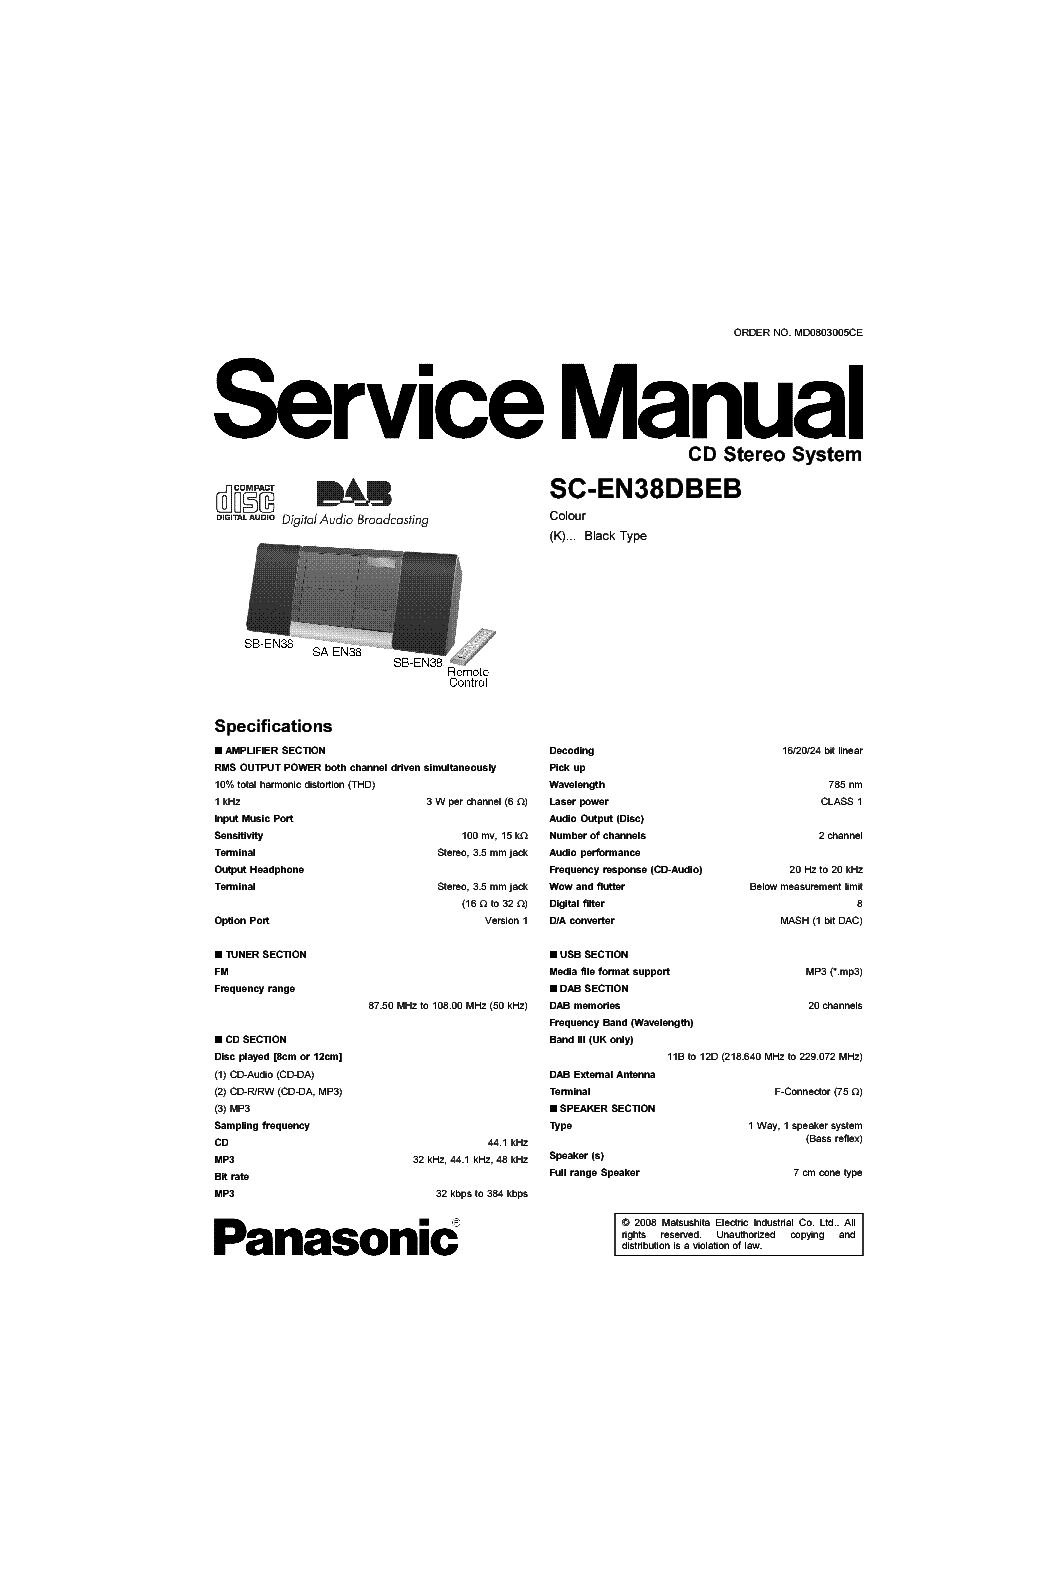 PANASONIC SC-EN38DBEB